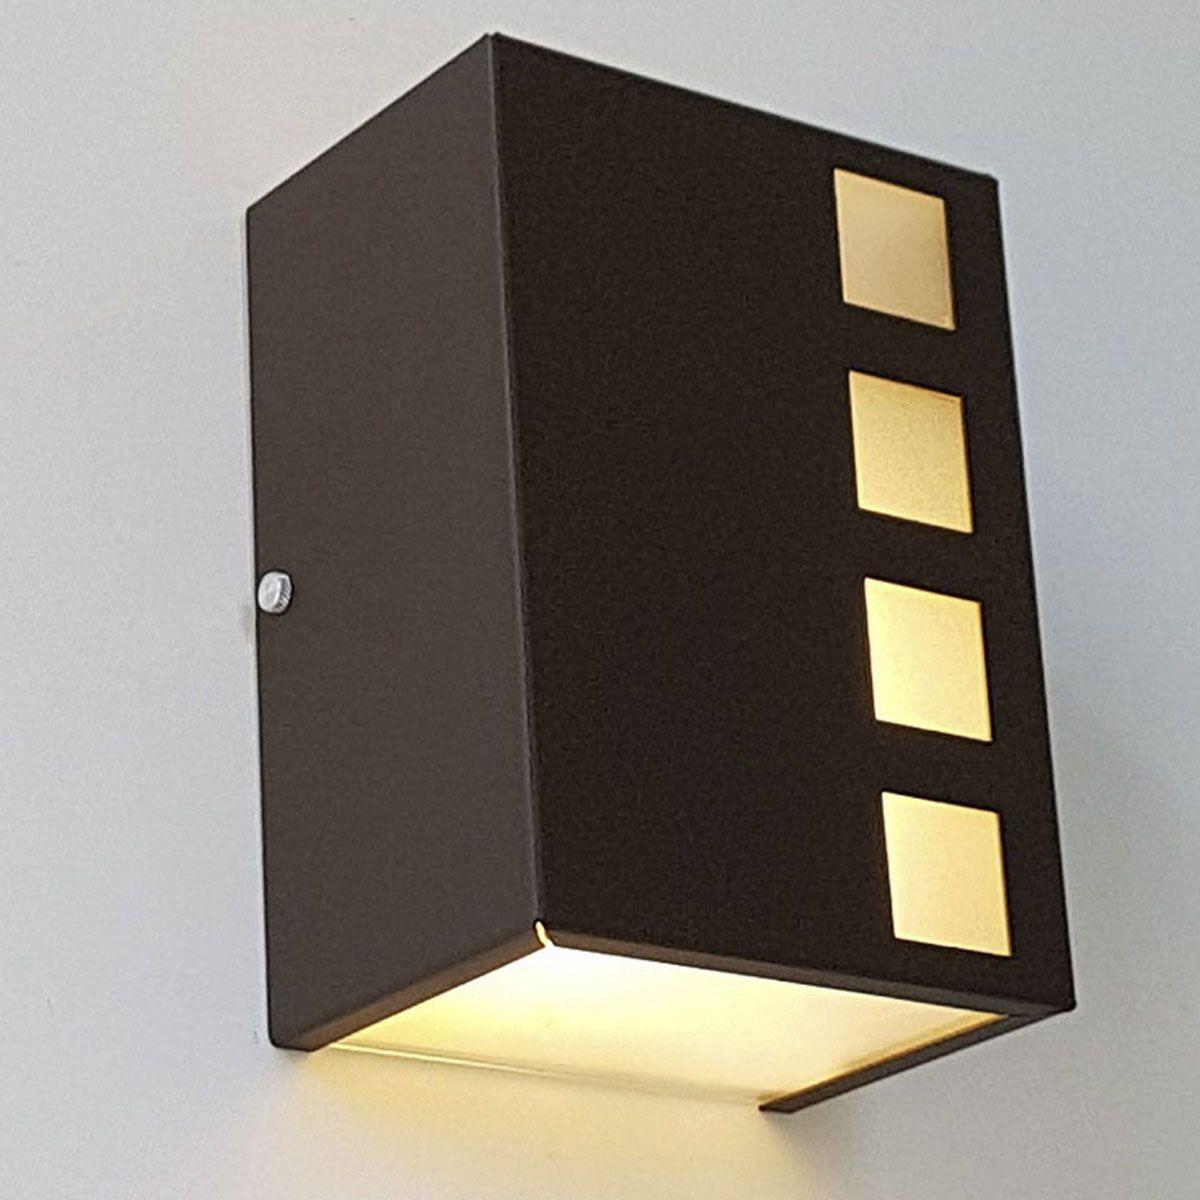 Luminária Arandela Decorativa Cubos Externa de Alumínio